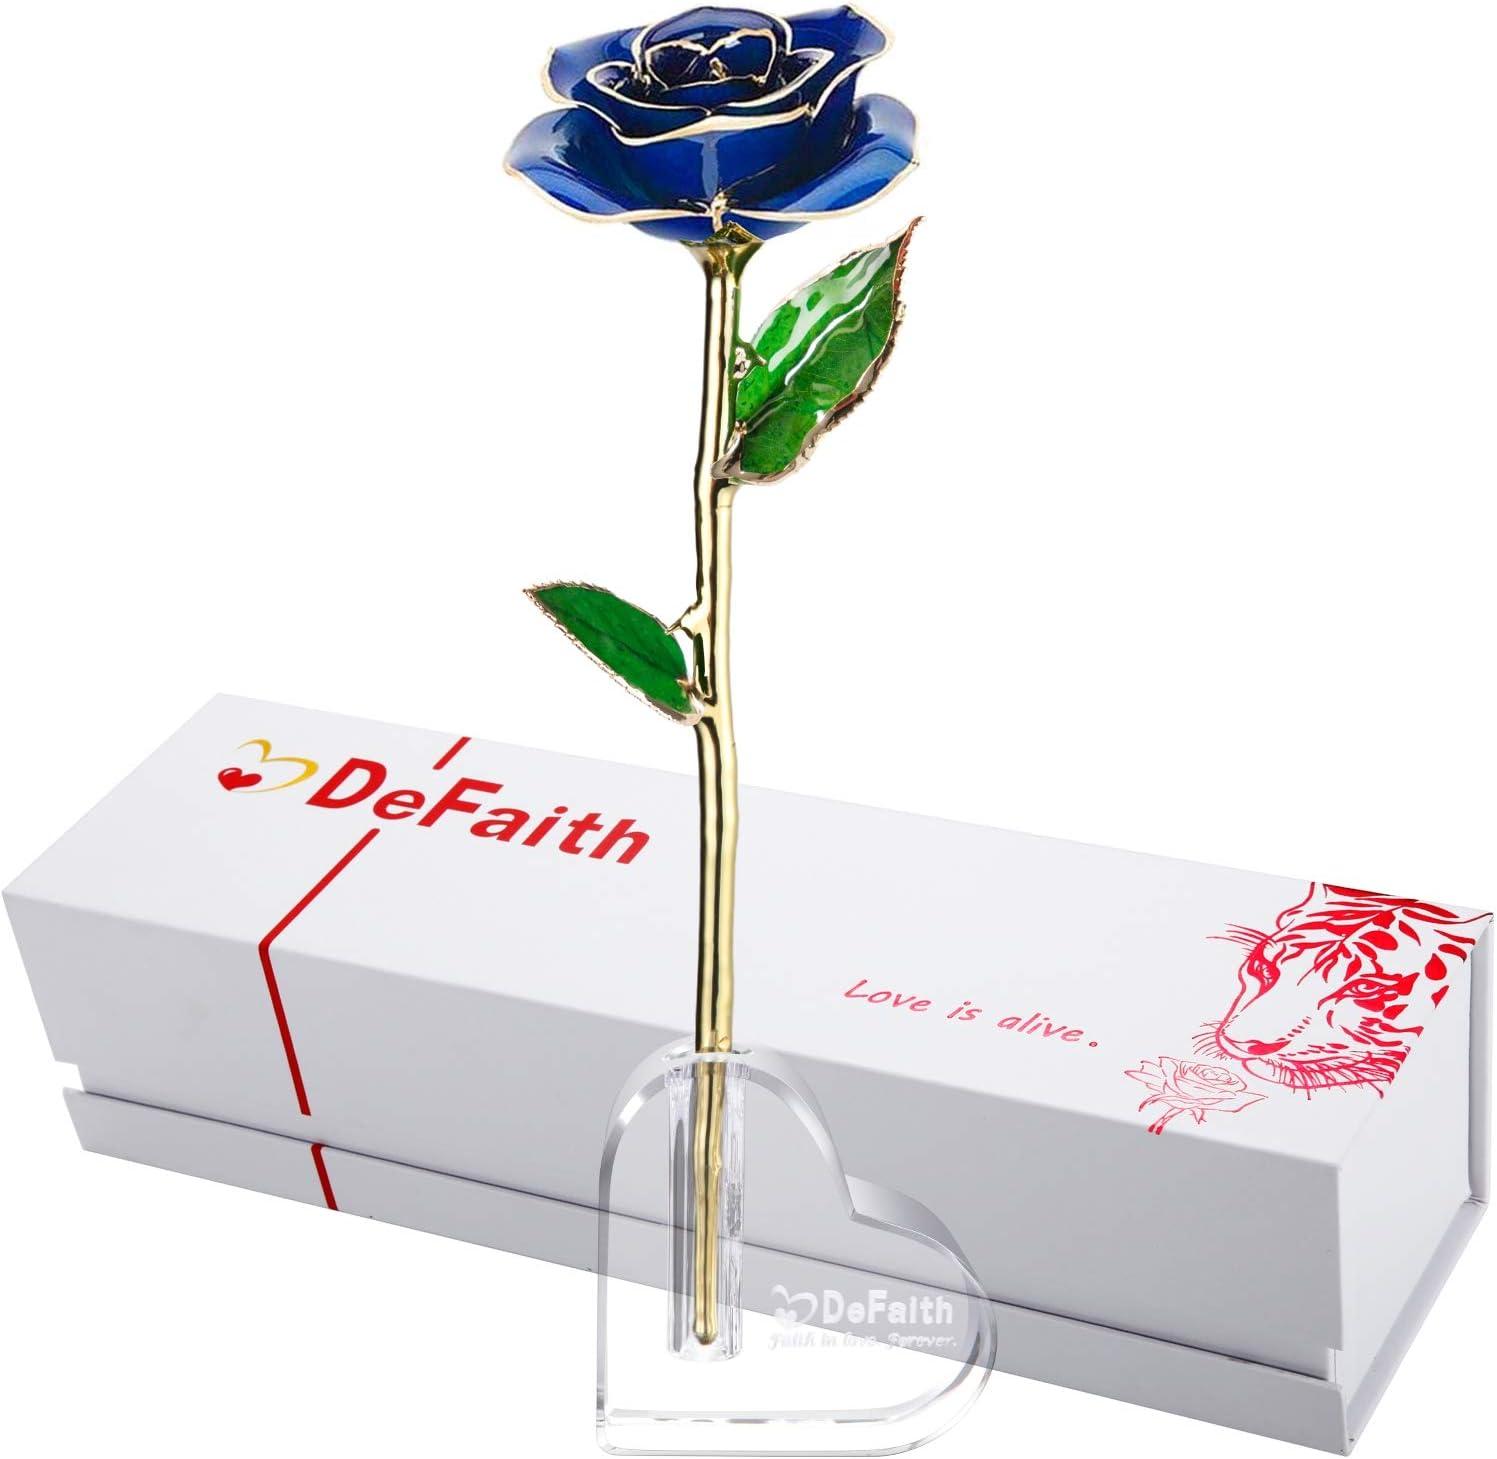 DEFAITH 24Kゴールドディップローズとクリスタルハートスタンド。 11 inch ブルー DF-GOLD-DIPPED-ROSE